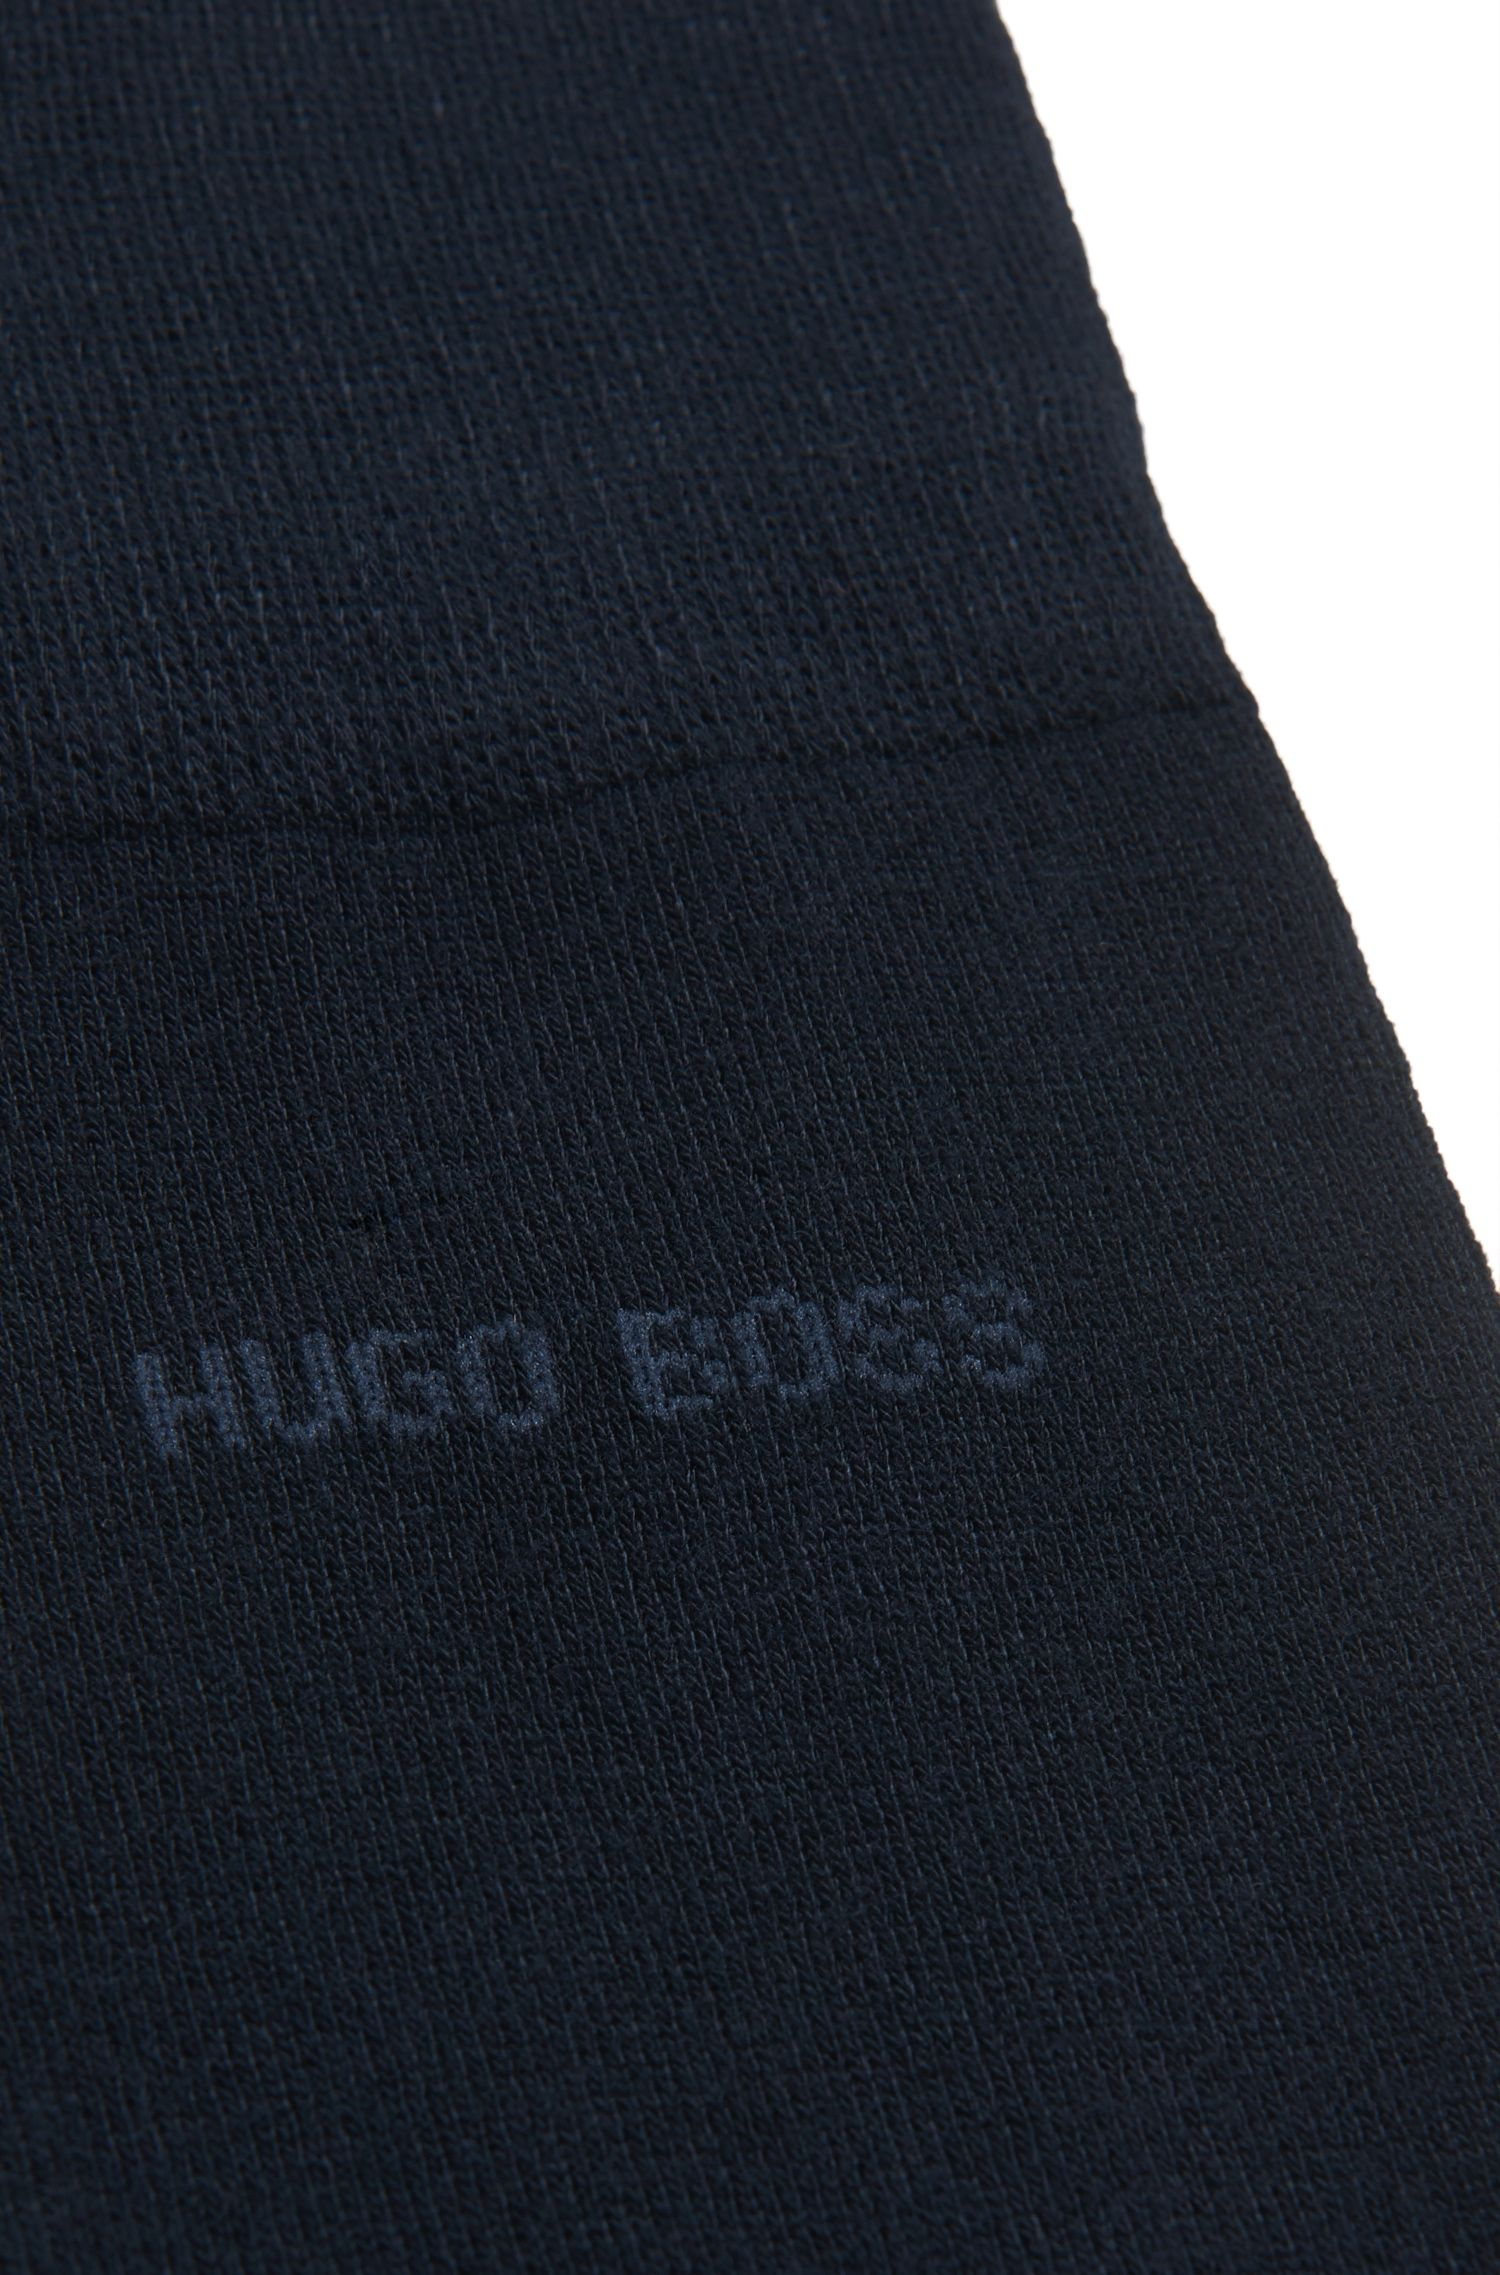 Socken aus Viskose-Mix: 'Edward RS Uni'